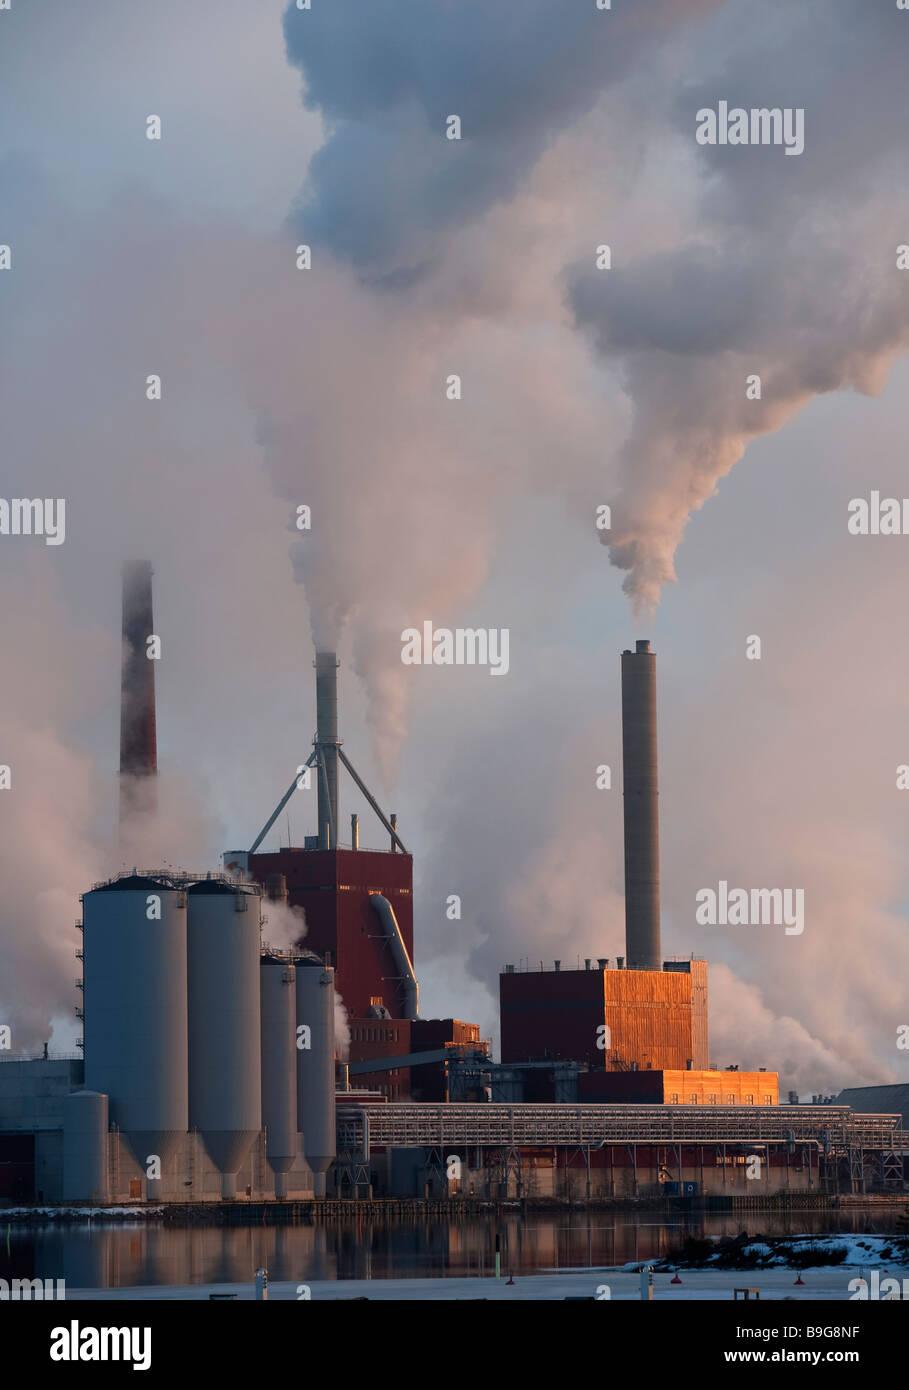 Stora-Enso paper mill at Nuottasaari Oulu Finland at sunset - Stock Image